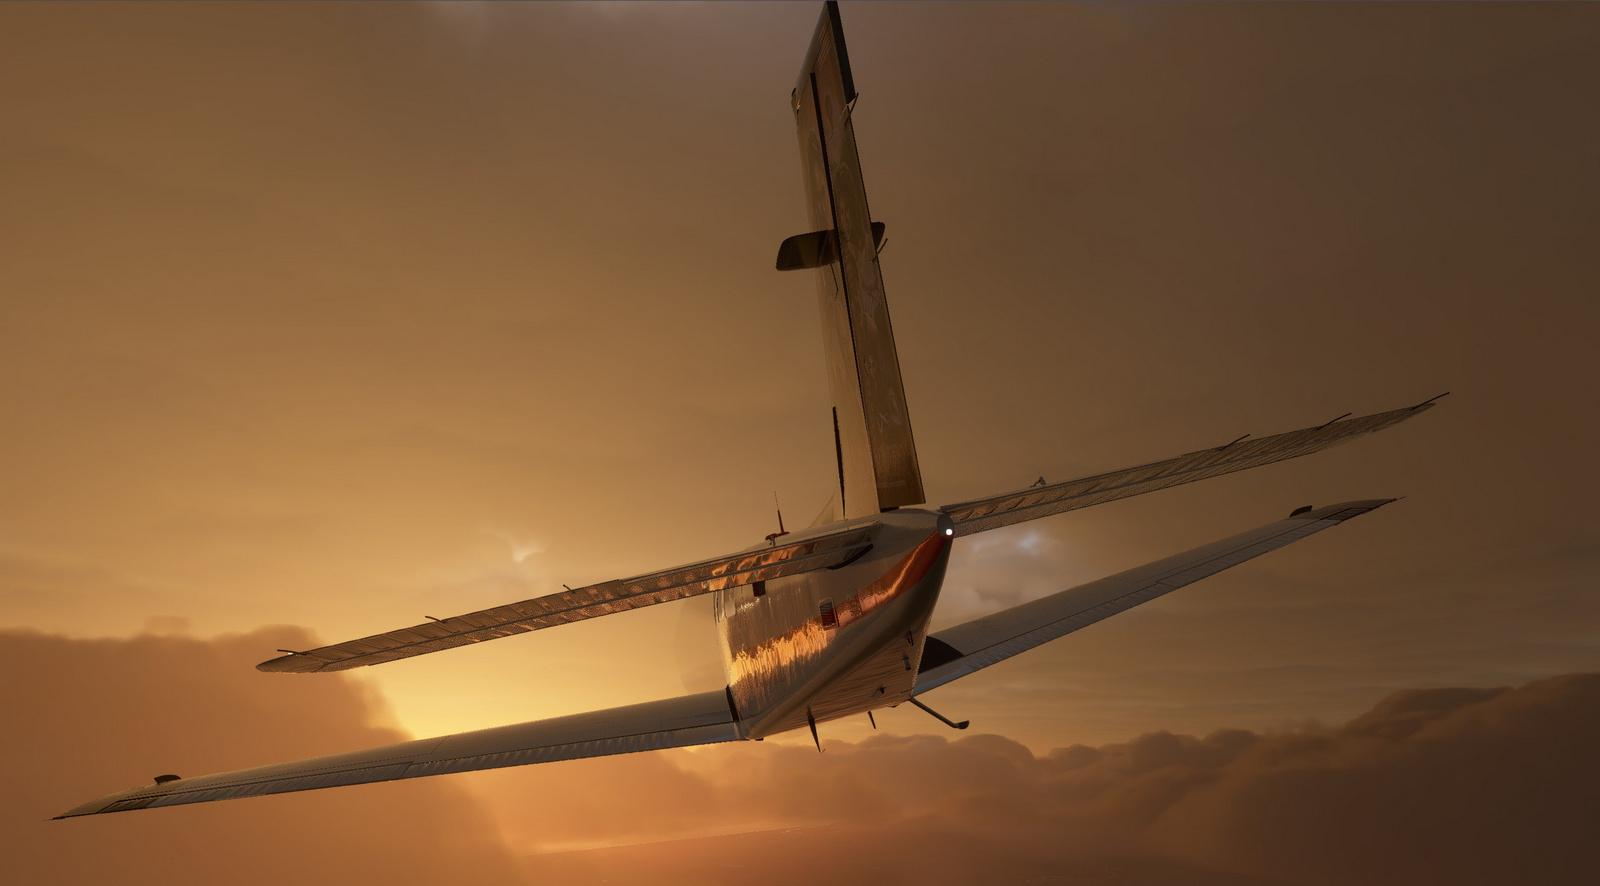 Macgyver repaint for Asobo Bonanza G36 for Microsoft Flight Simulator